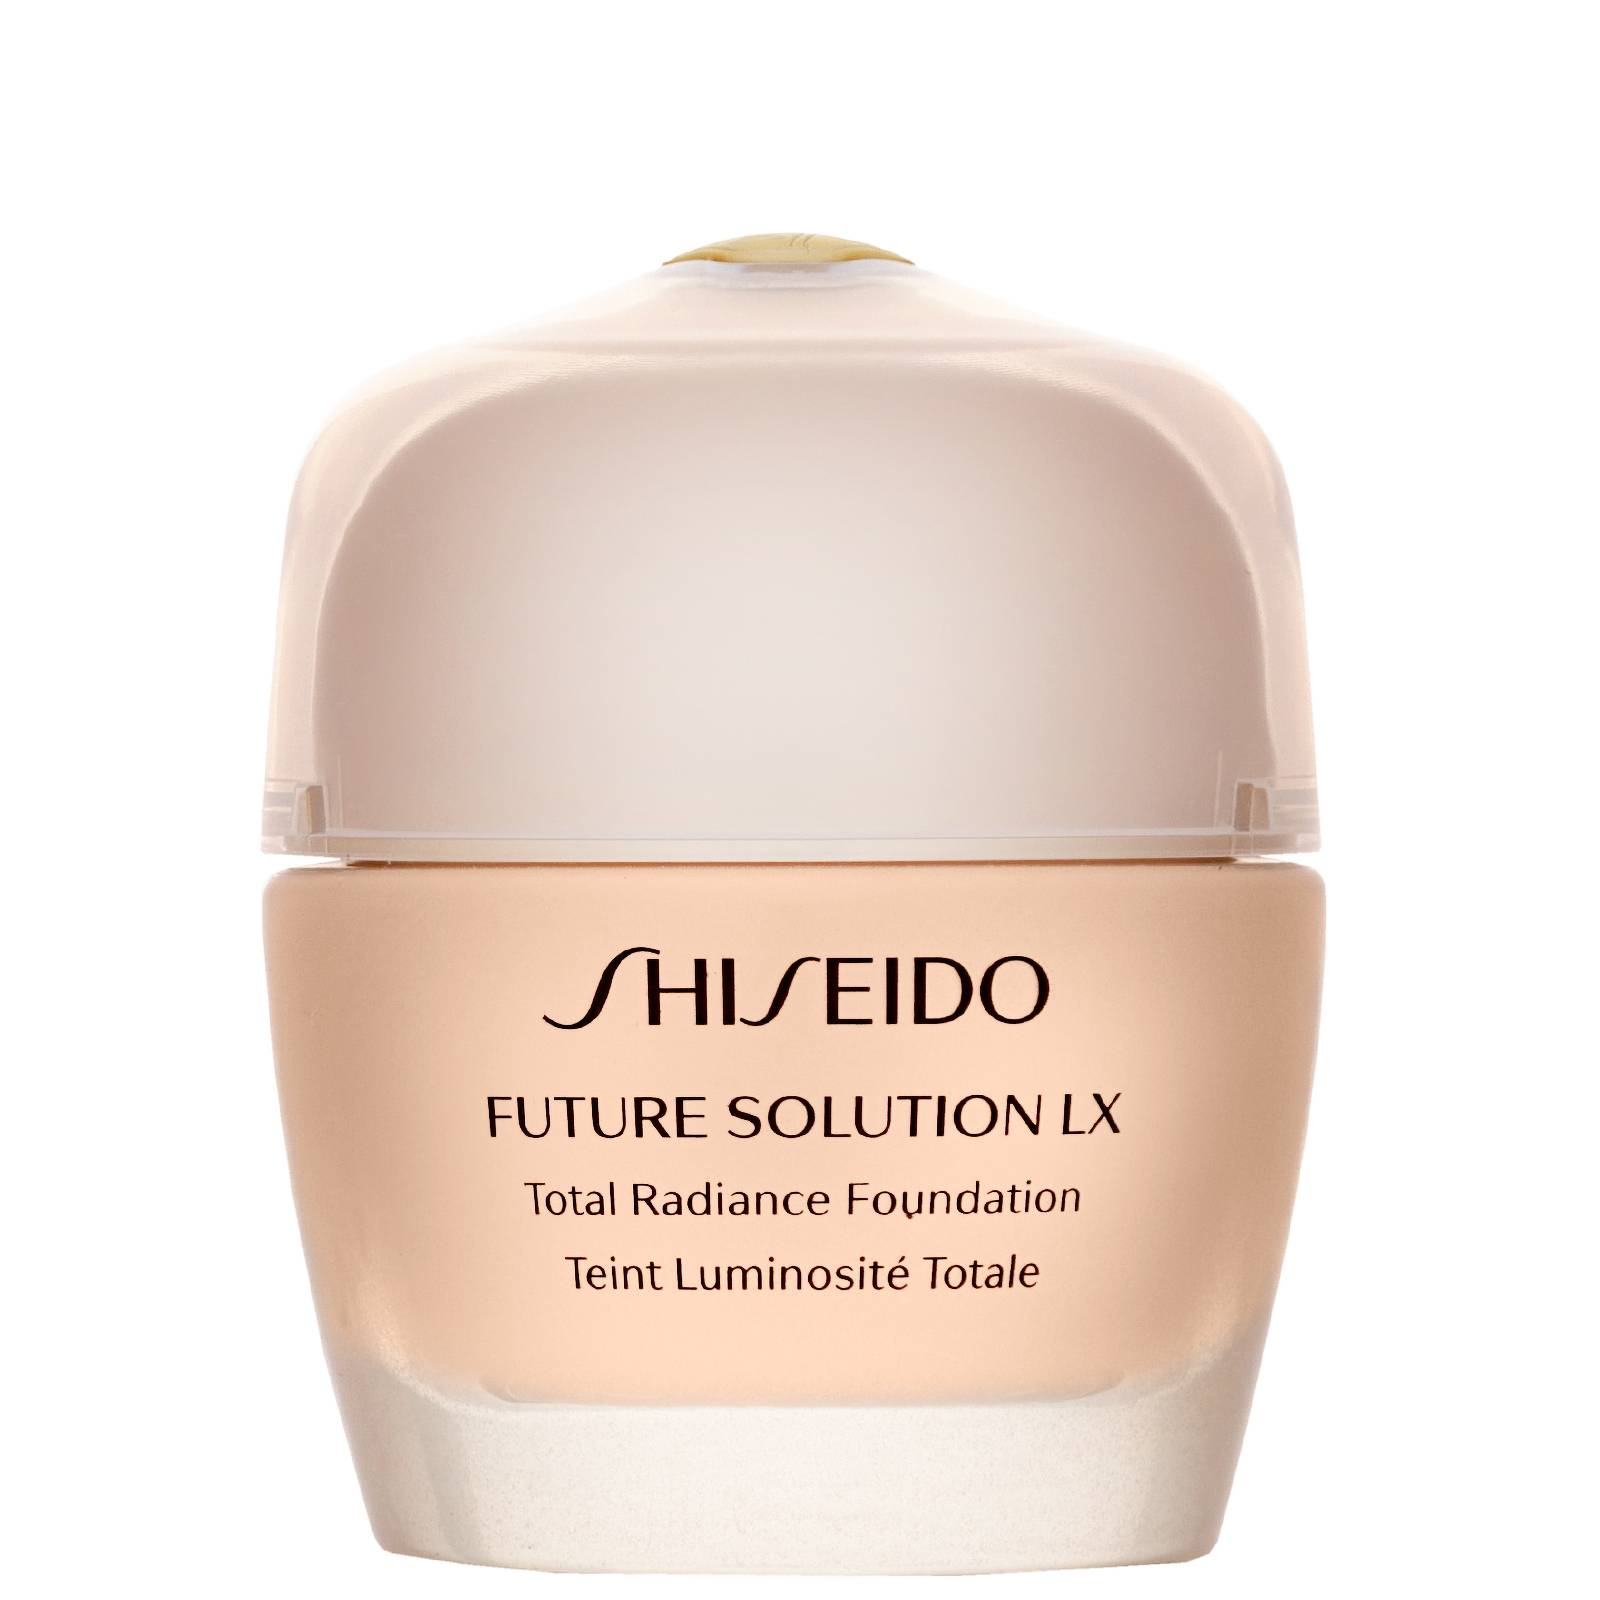 Shiseido Future Solution LX Total Radiance Foundation SPF15 3 Golden 30ml / 1 oz.